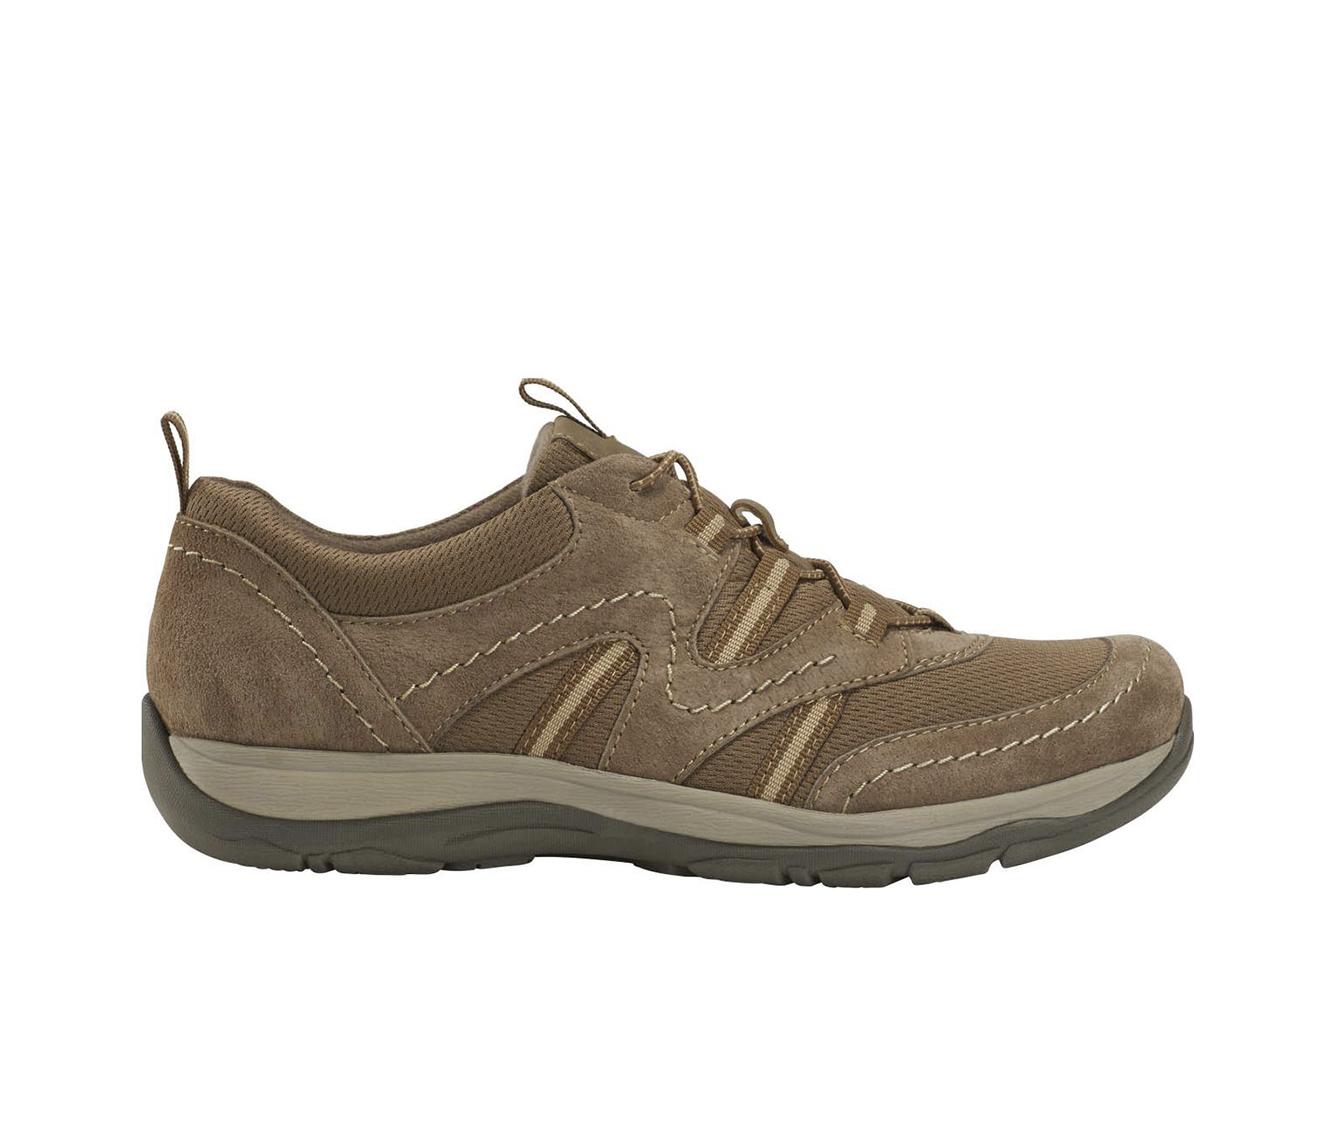 Earth Origins Luci Landon Women's Shoe (Brown Suede)